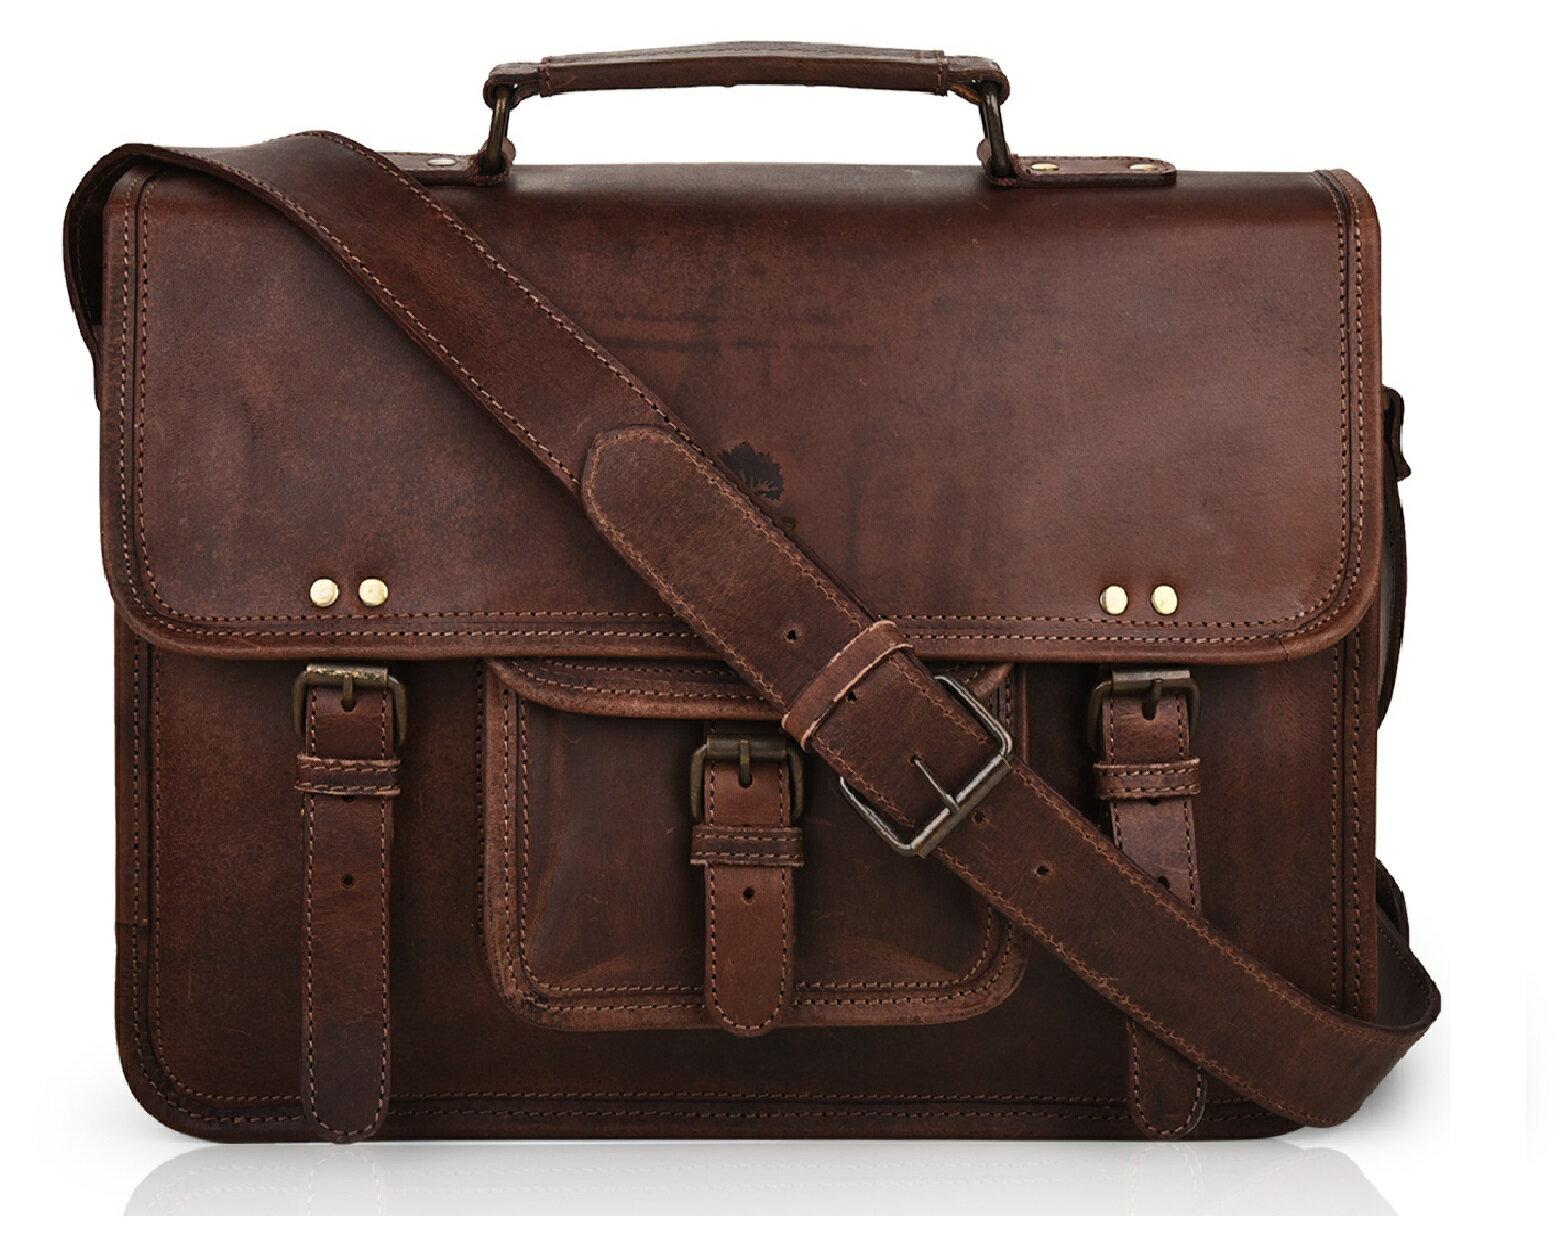 15 Inch Leather Vintage Rustic Crossbody Messenger Courier Satchel Bag Gift Men Women Business Work